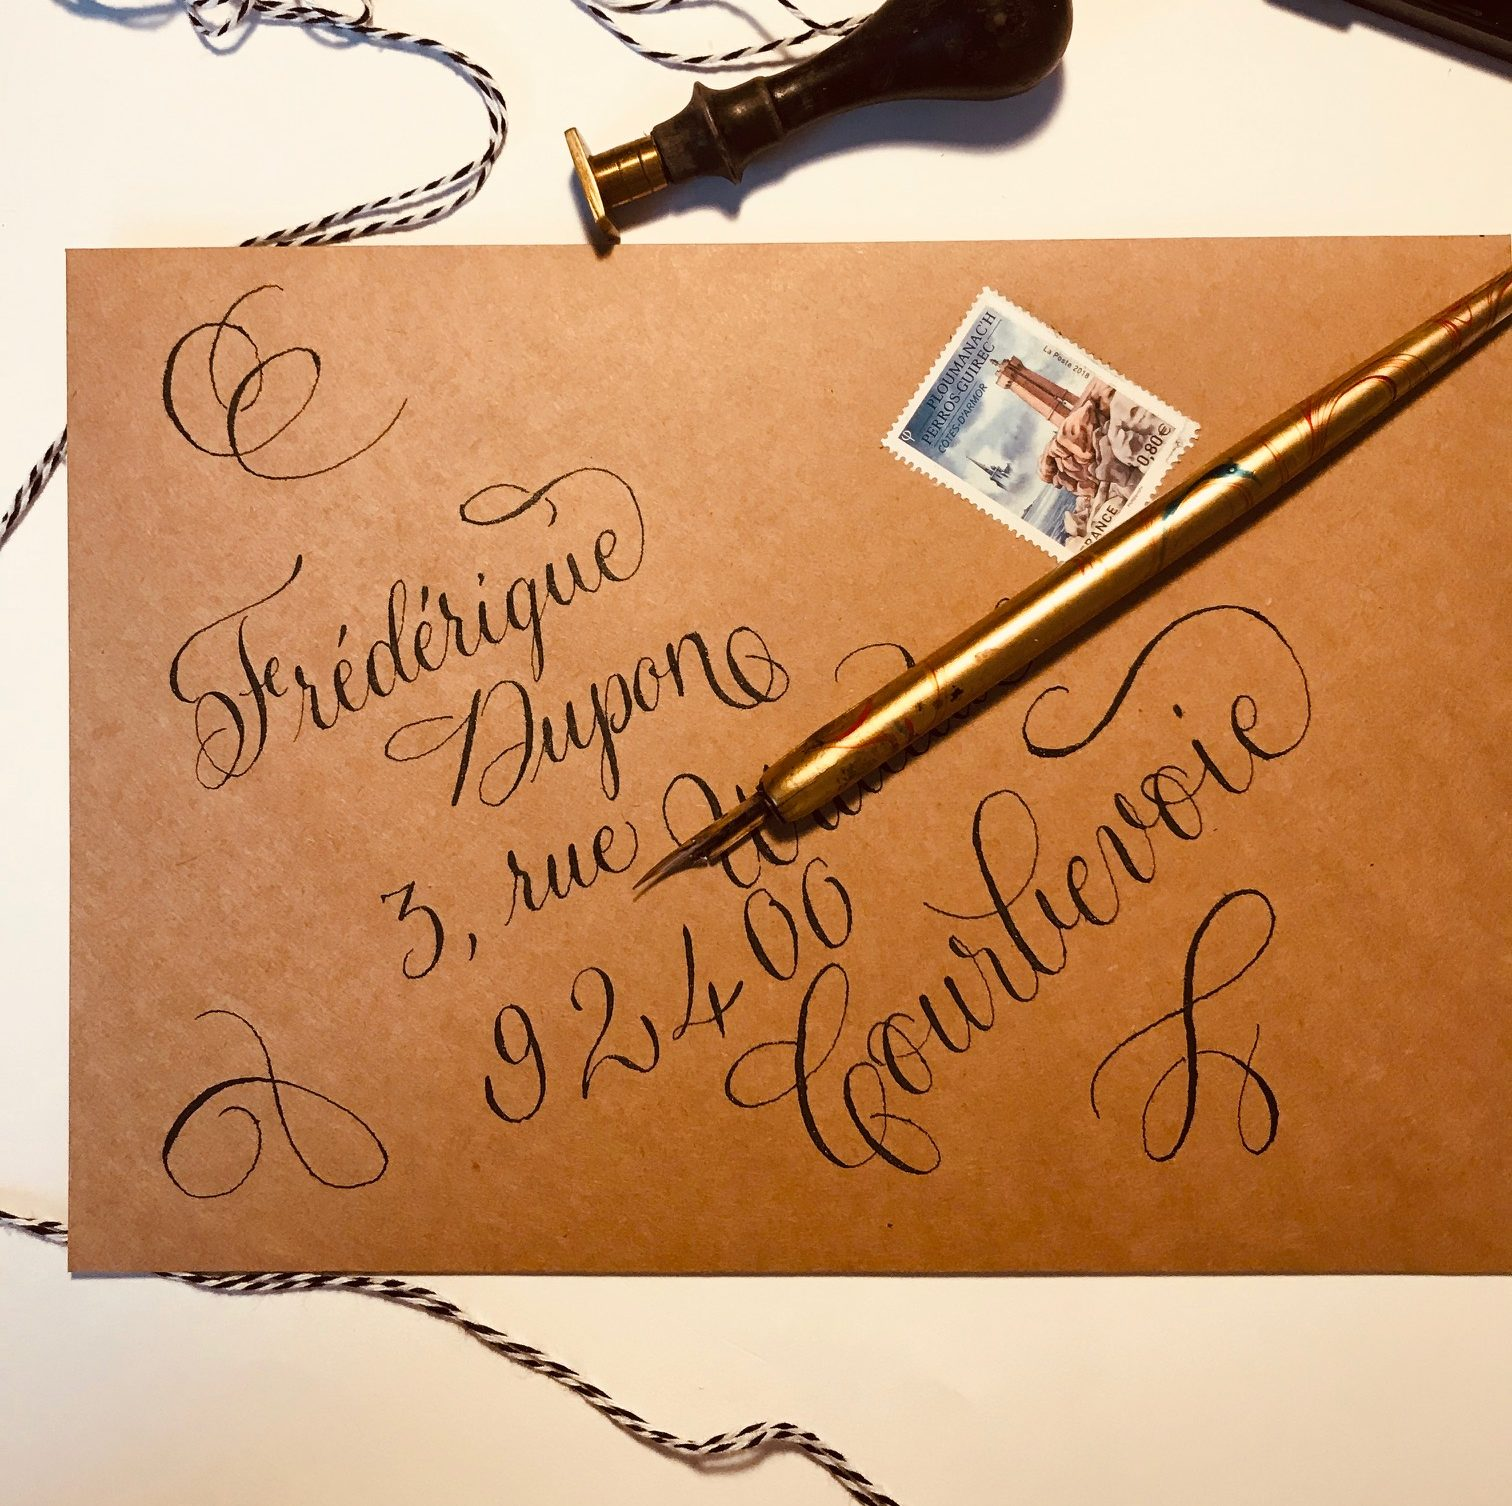 #colirocolors #finetec #mailart #happymail #snailmail #envelope #enveloppe calligraphie #calligraphie